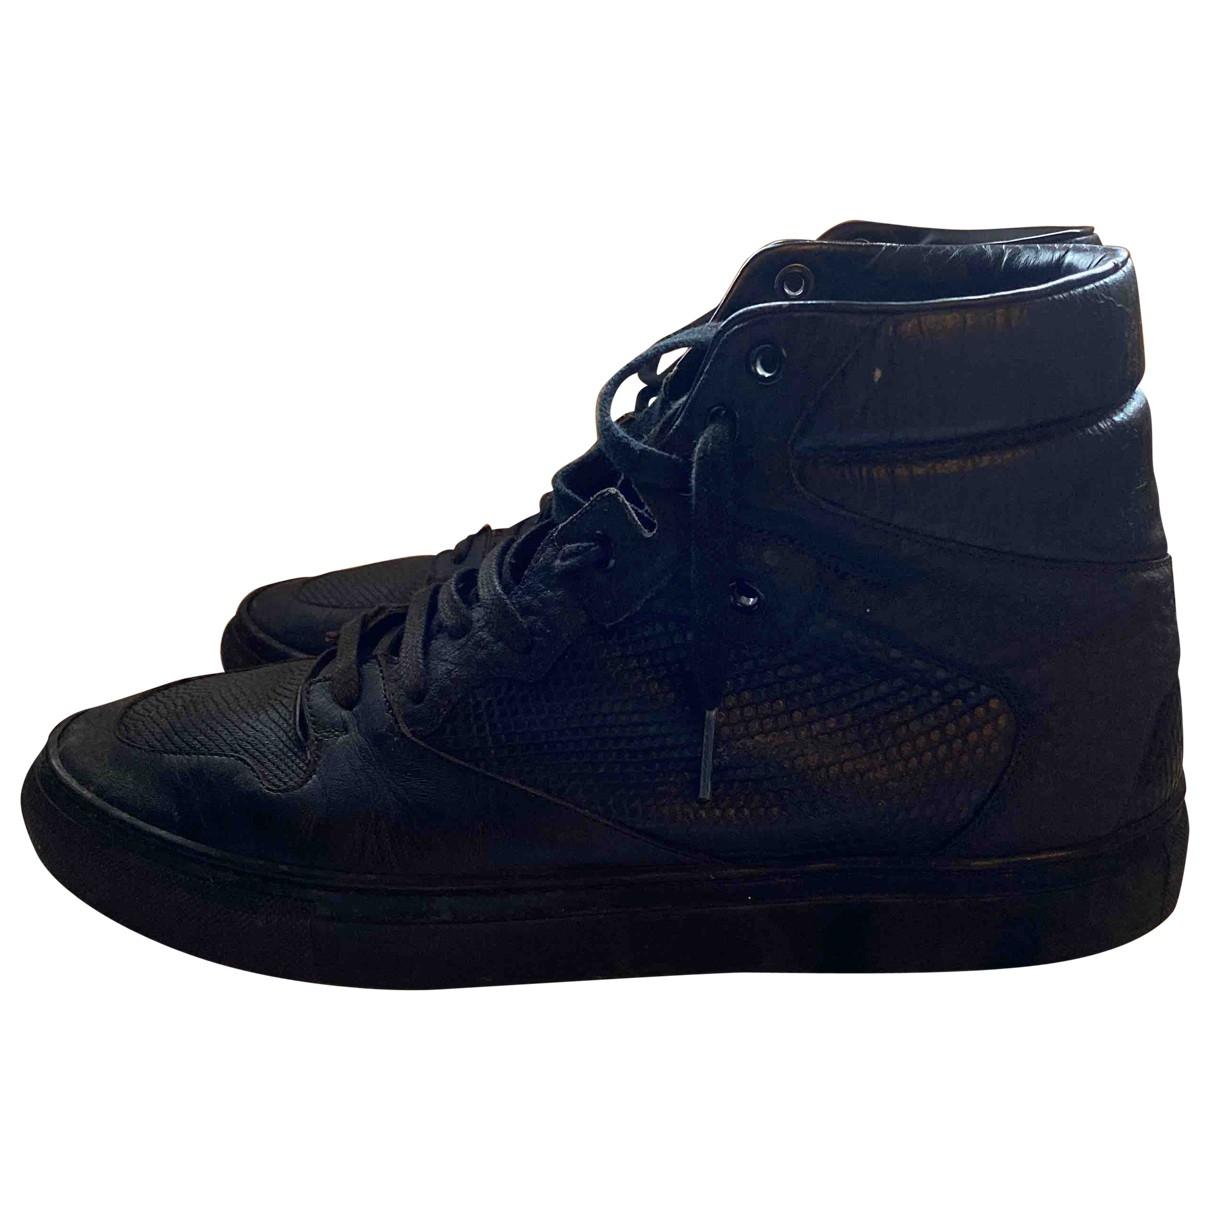 Balenciaga \N Black Leather Trainers for Men 41 EU